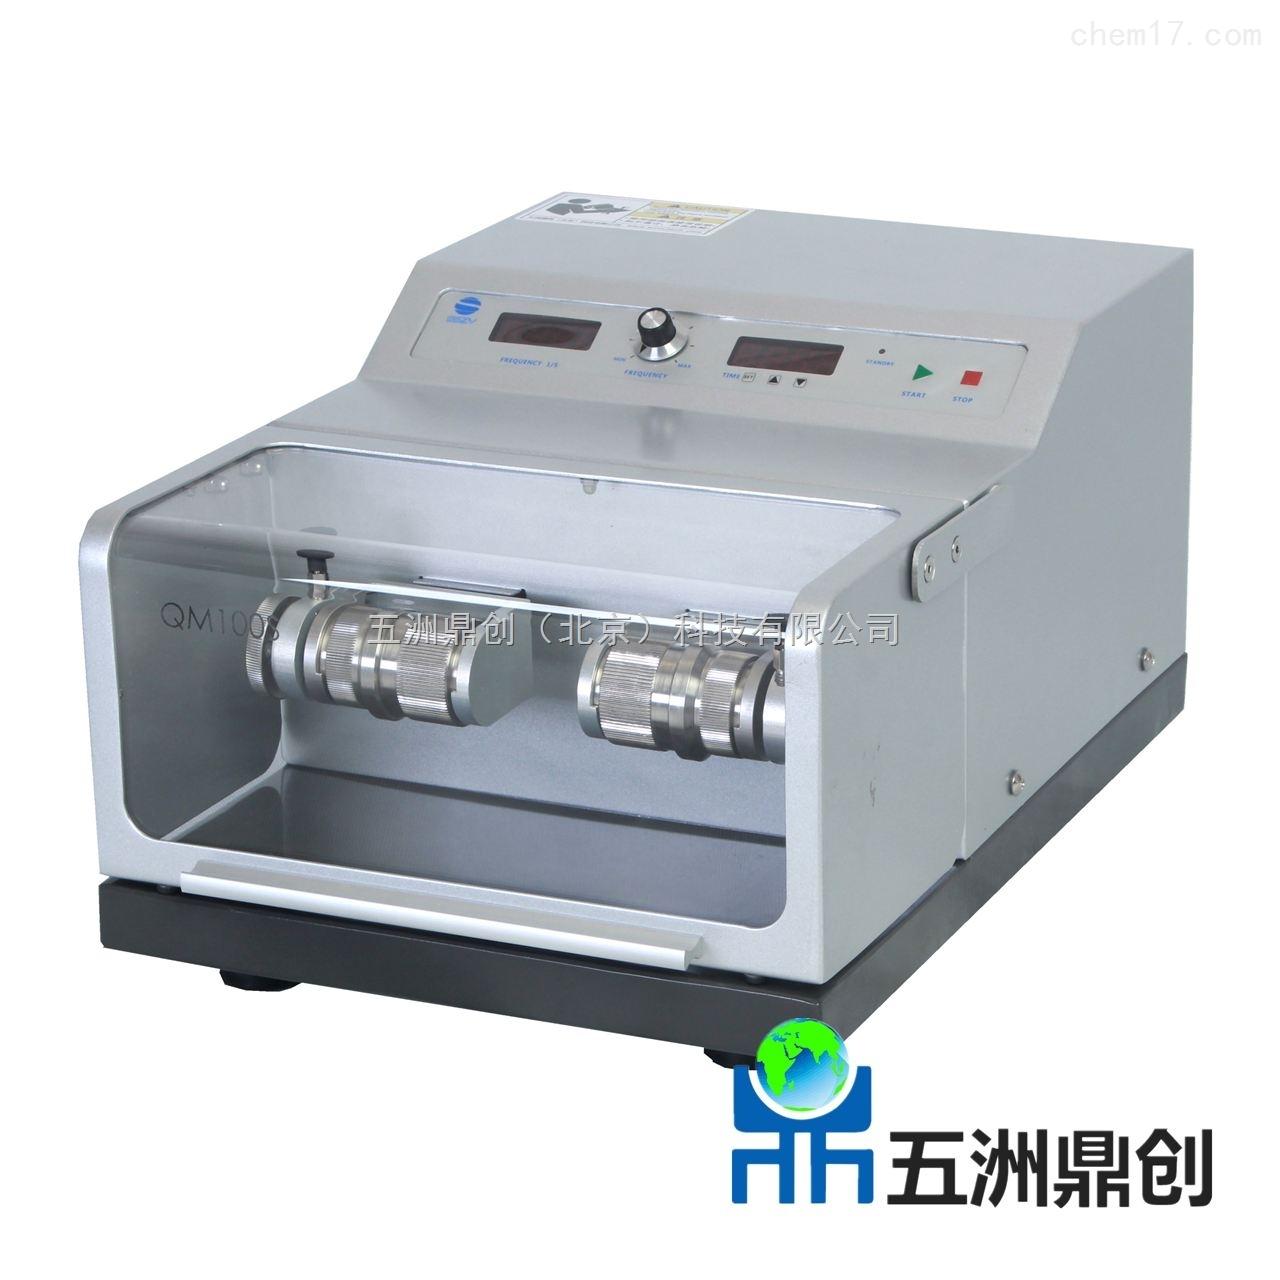 QM100S冷冻混合型球磨仪多功能实验室 研磨仪